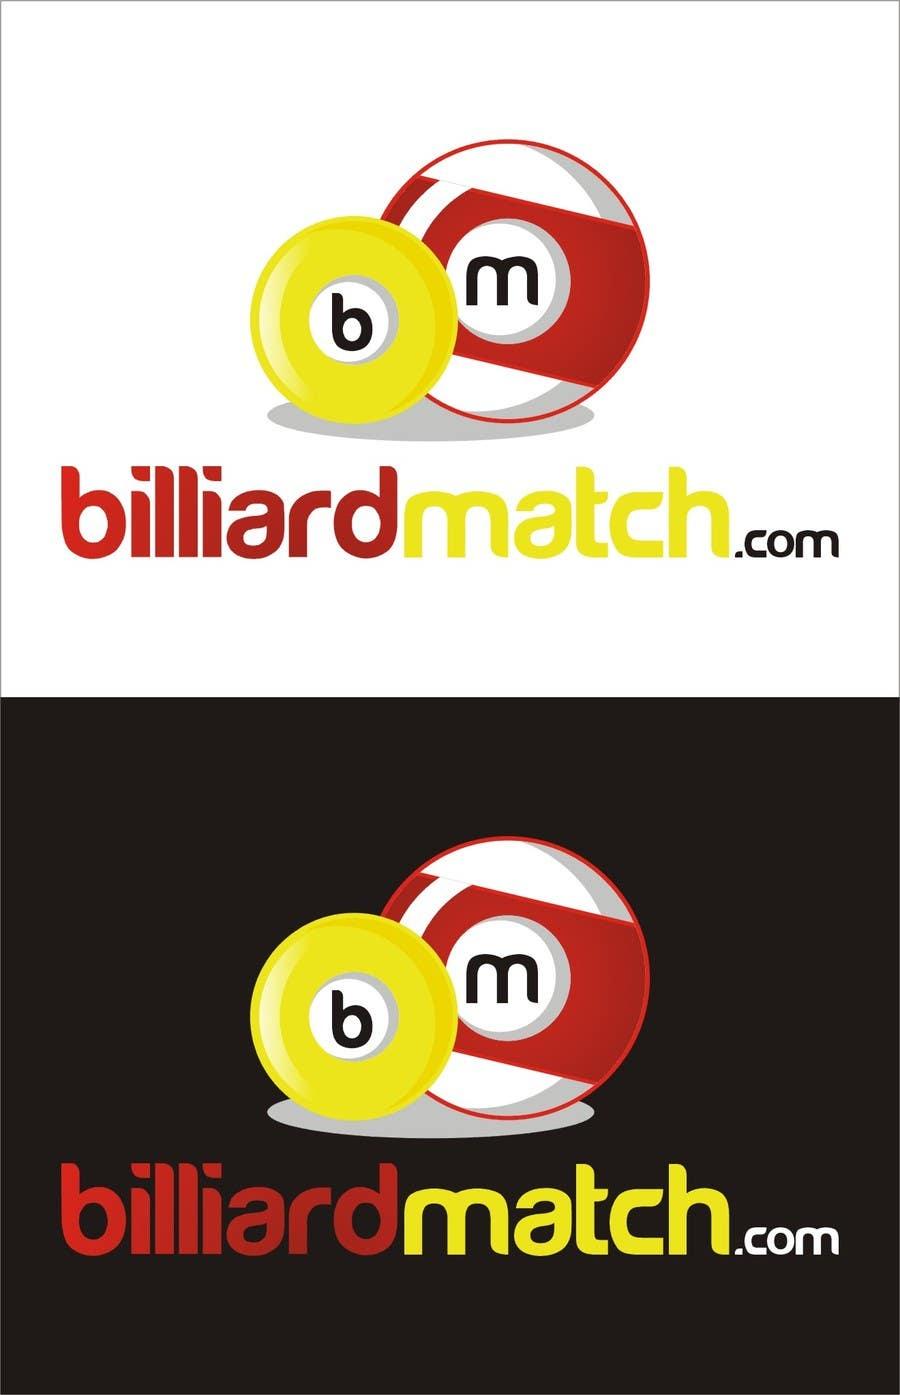 Bài tham dự cuộc thi #                                        7                                      cho                                         Design a Logo for a billiard tournament & score-keeping website.